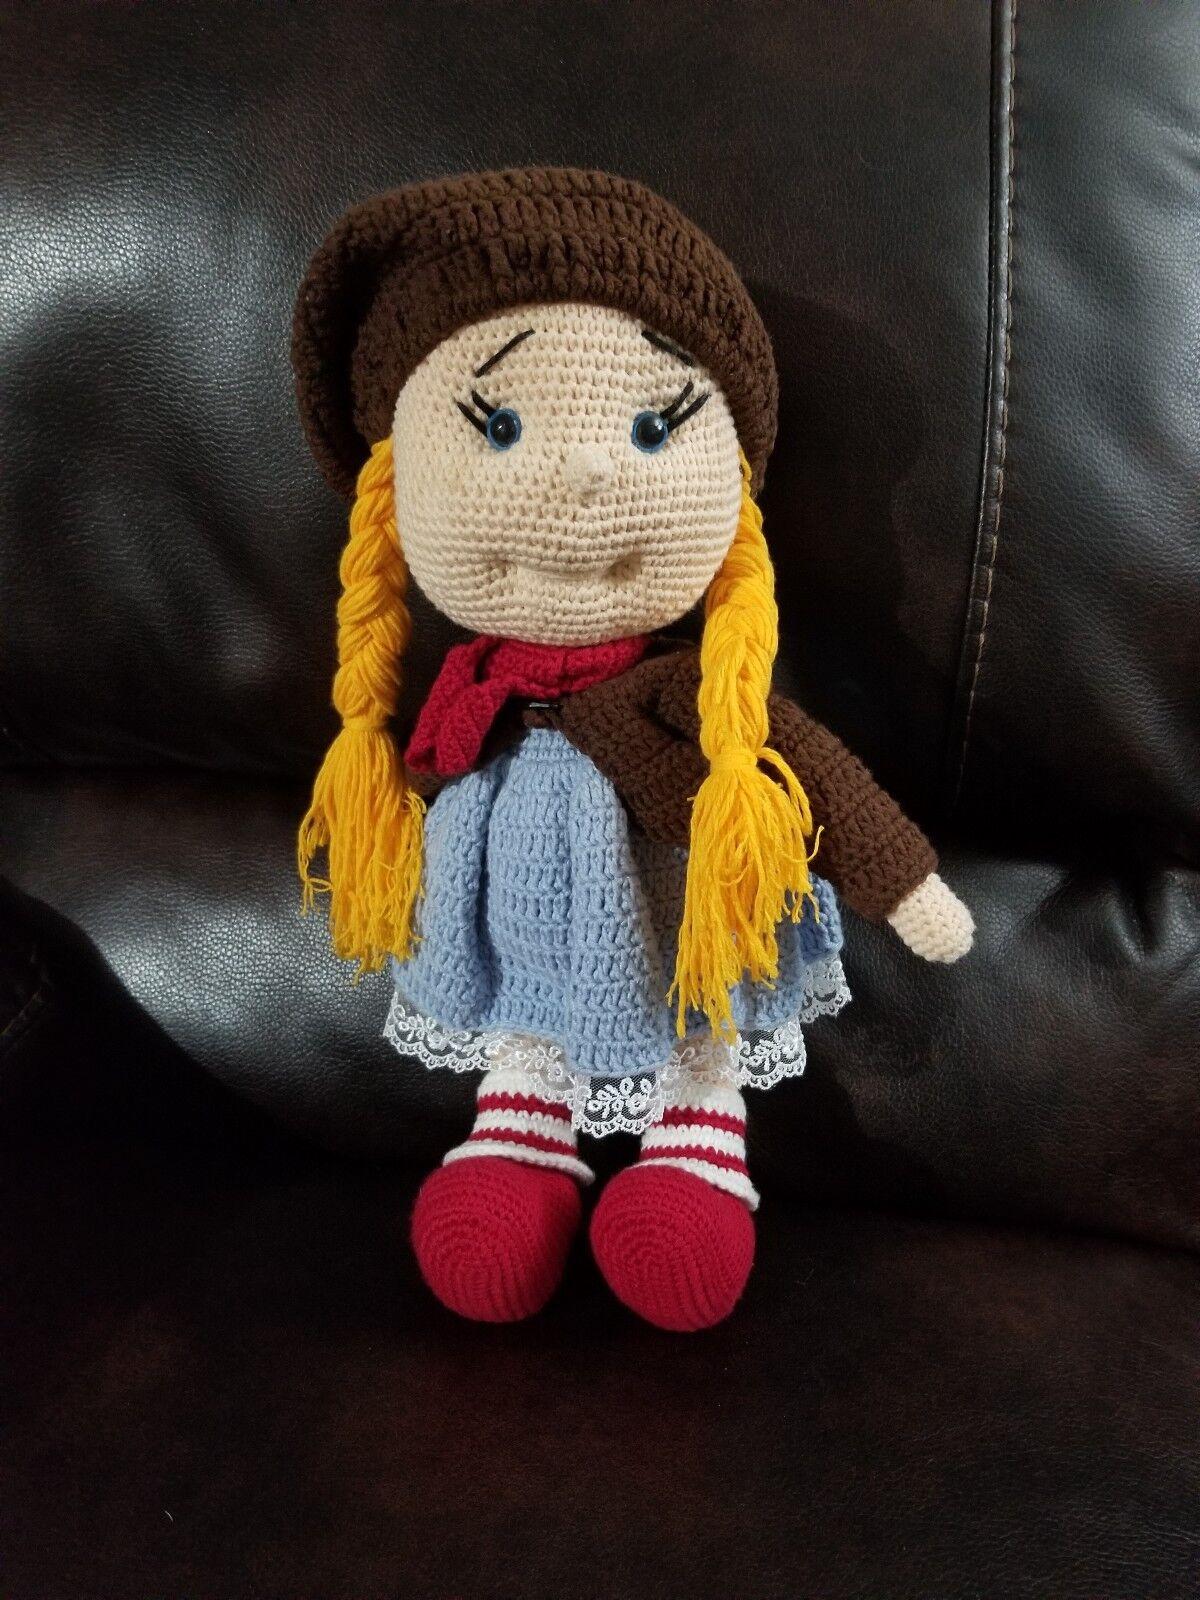 New Handmade Handmade Crochet Stuffed Doll Toy About 16 , Knit Doll, Amigurumi Doll